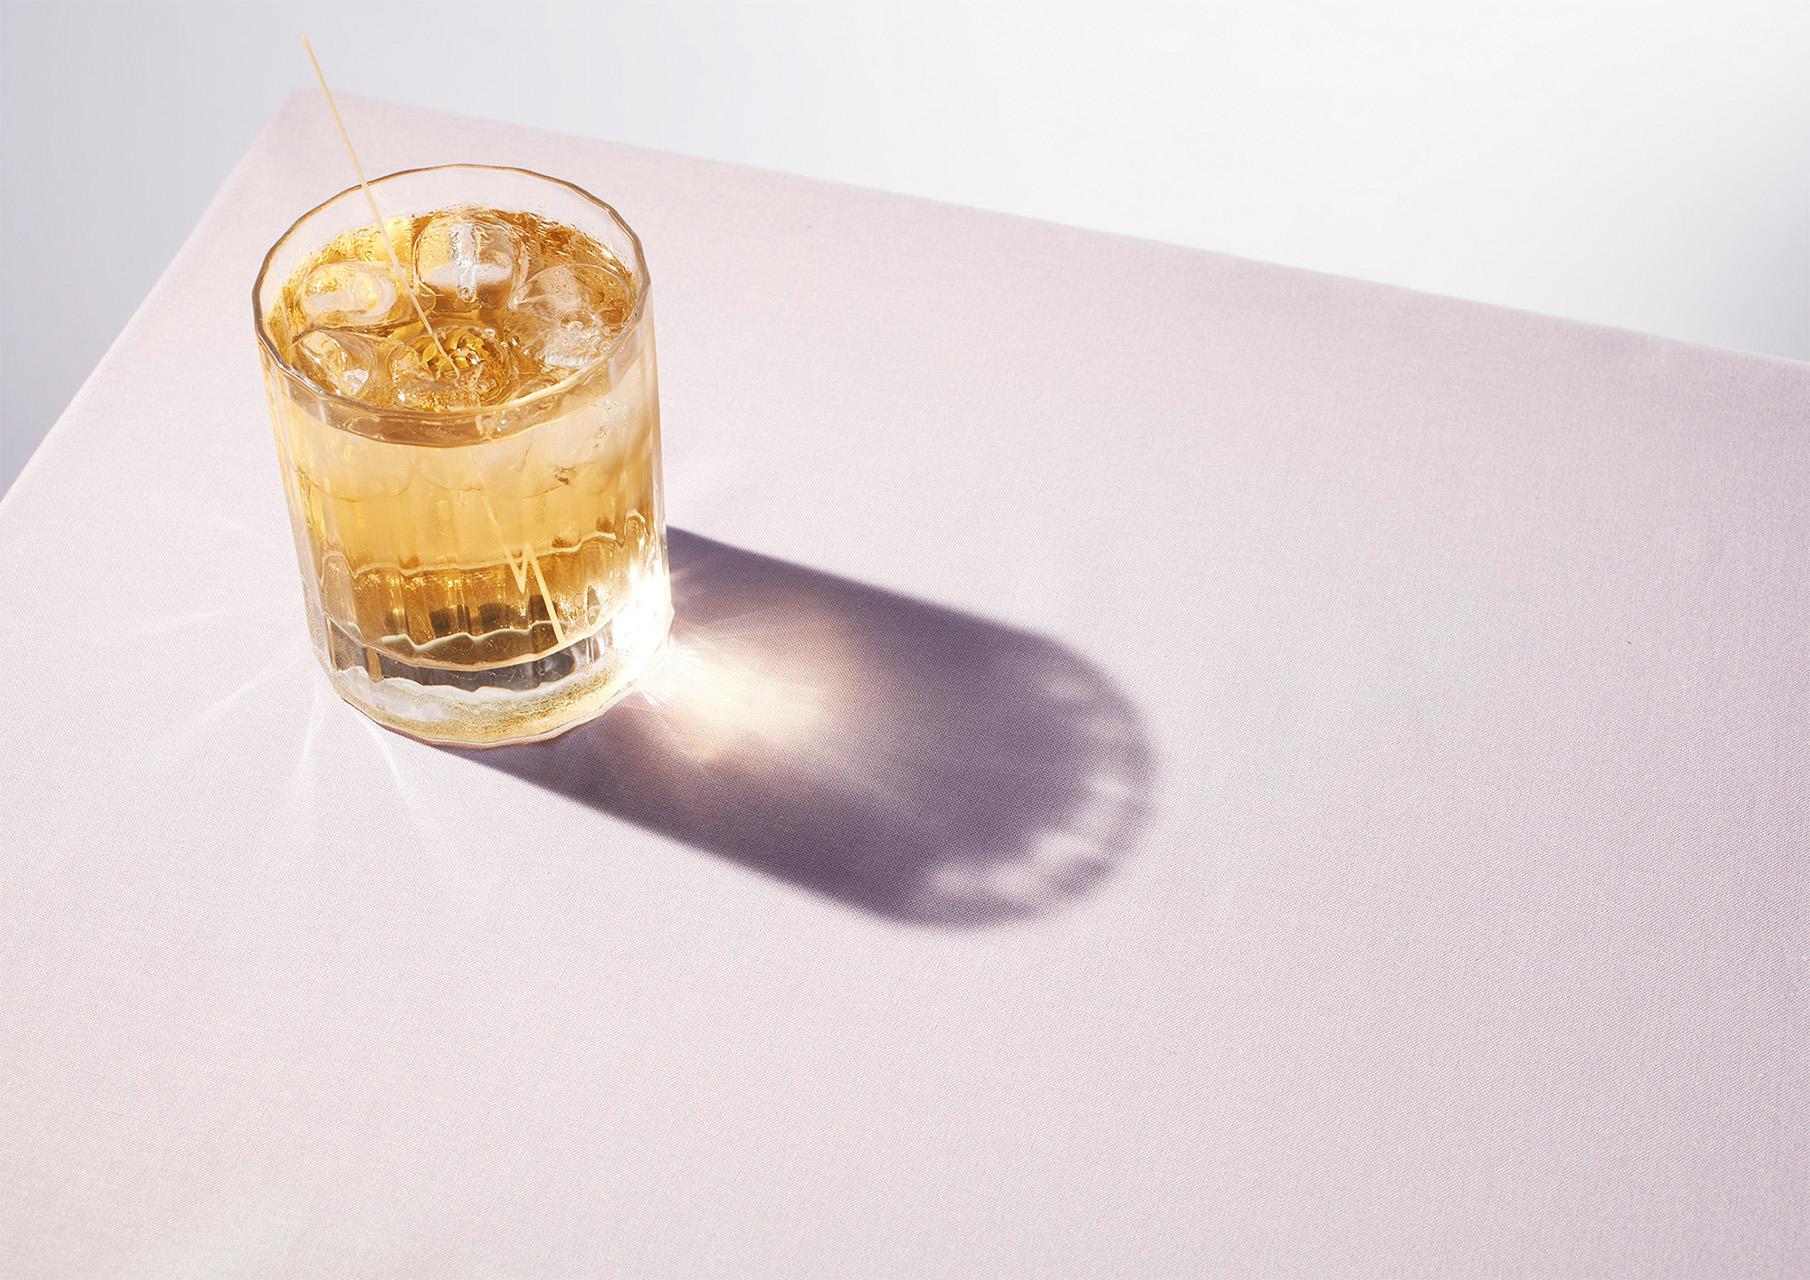 Zubrowka & Apple Juice aka: The Frisky Bison